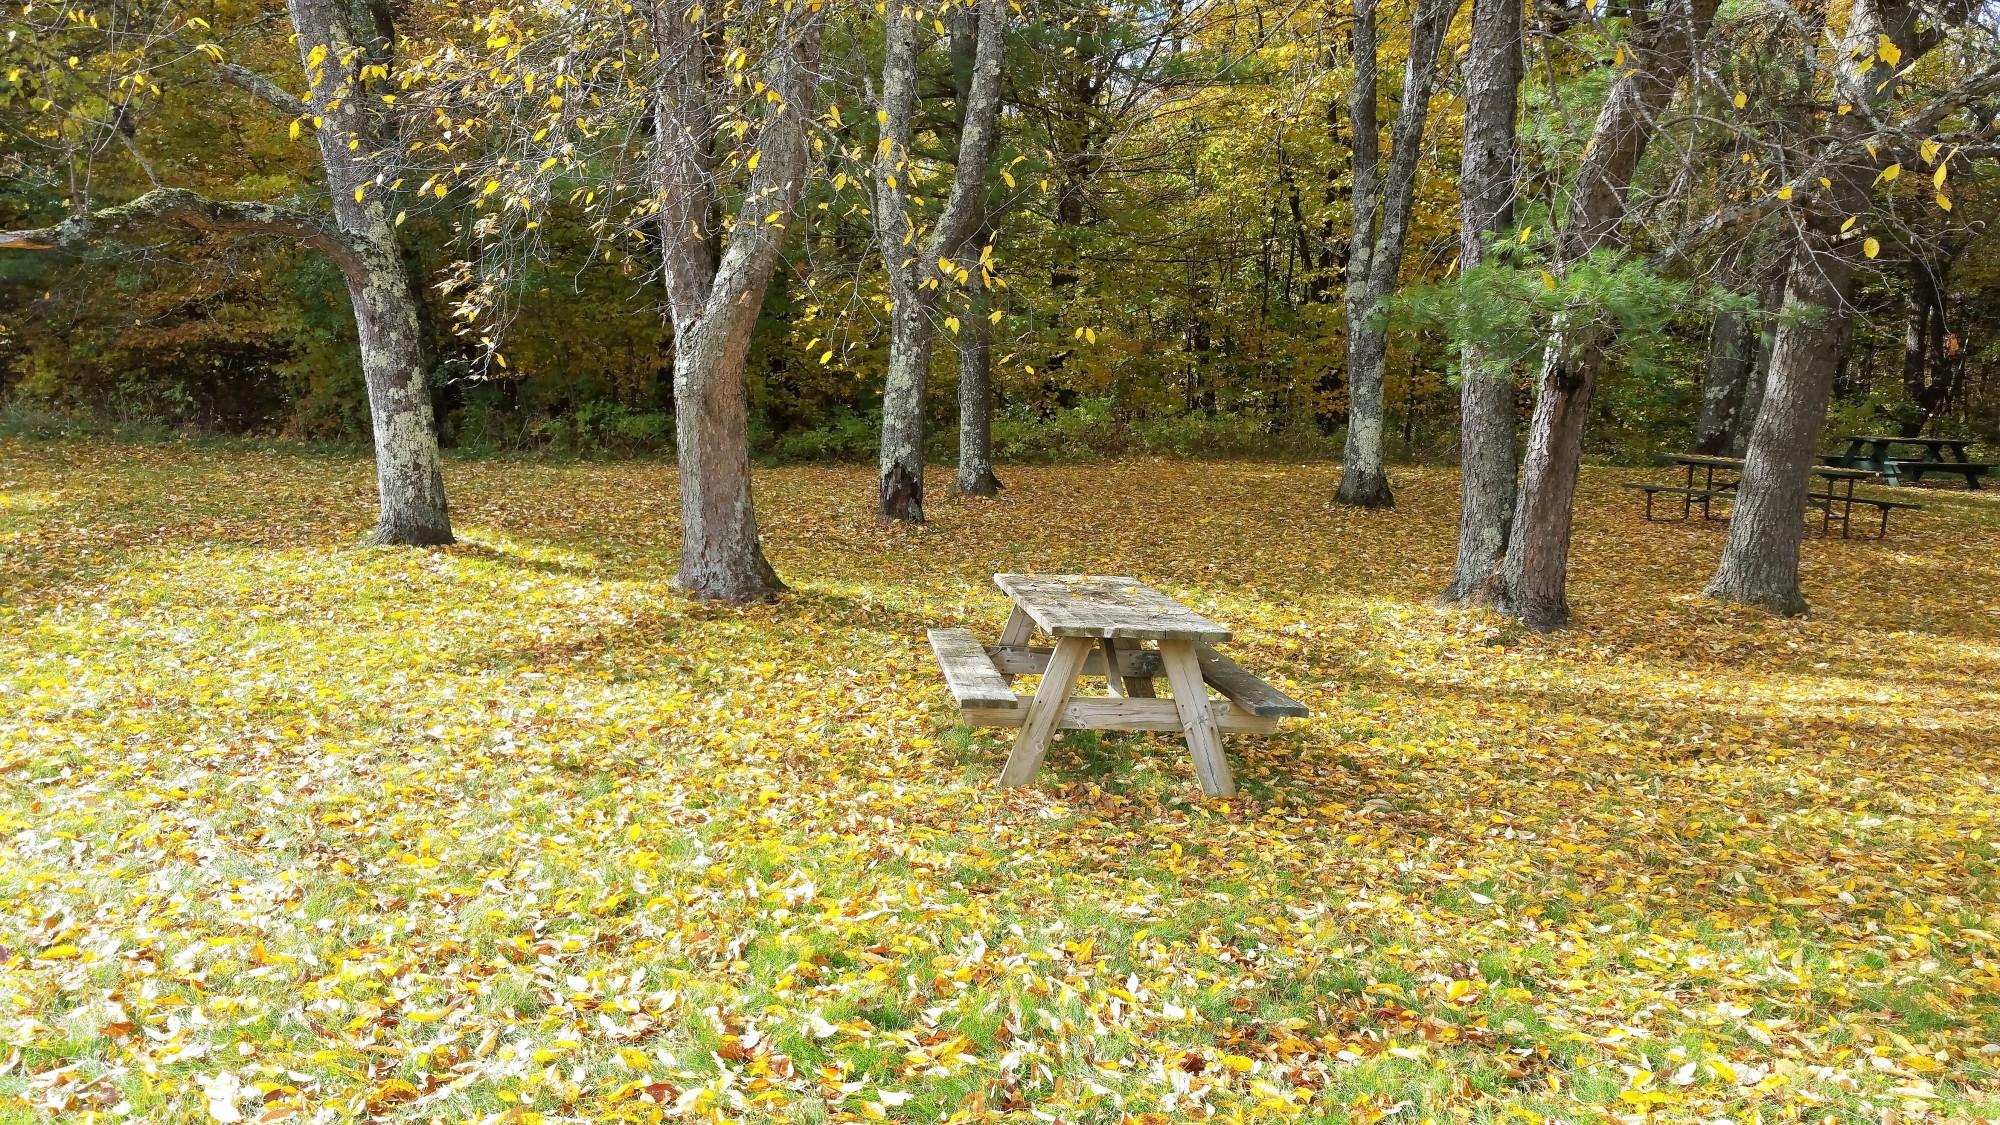 vermont-foliage-10-17-15